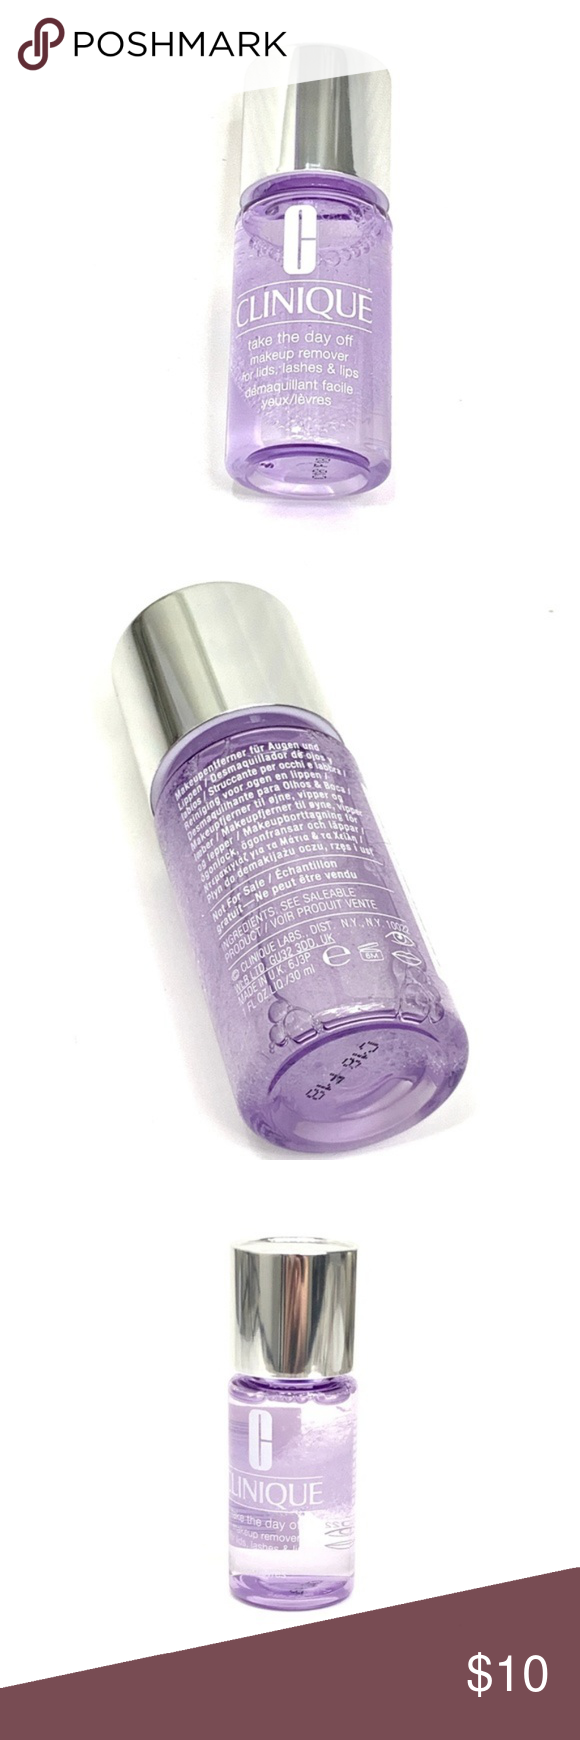 5 FOR 25 Makeup Remover Lip makeup remover, Clinique